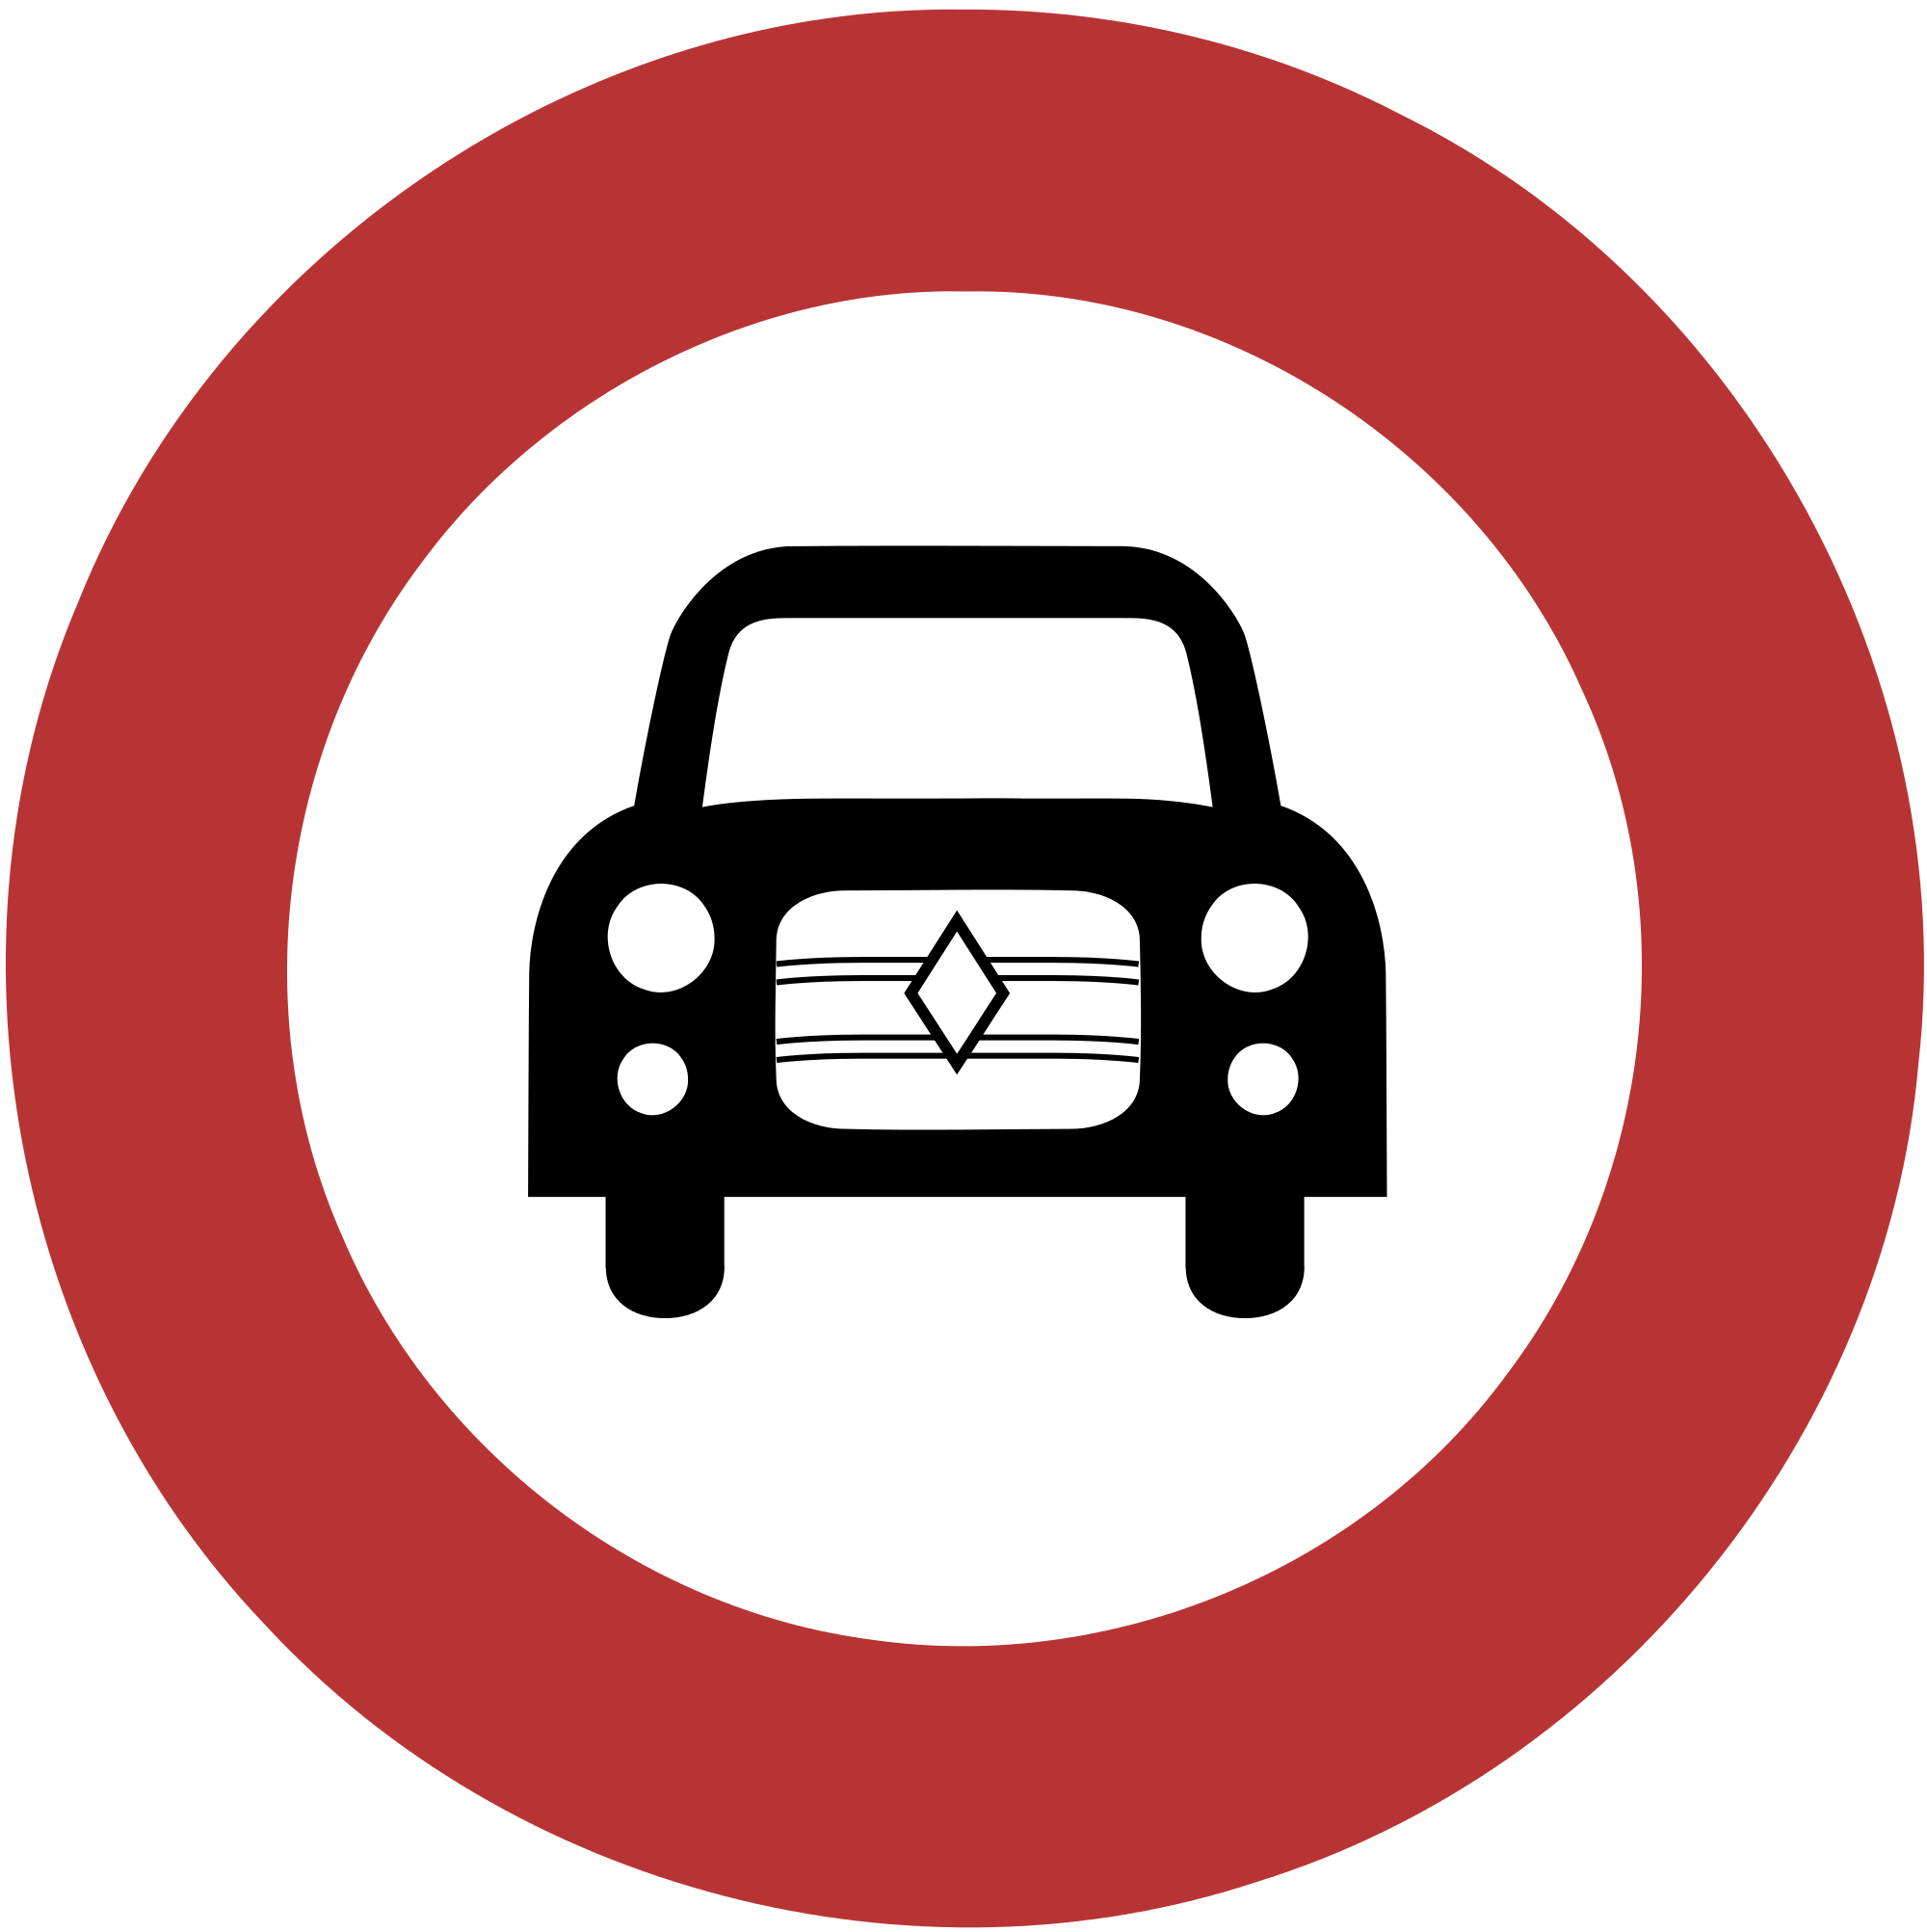 verantwortung autonomes fahren